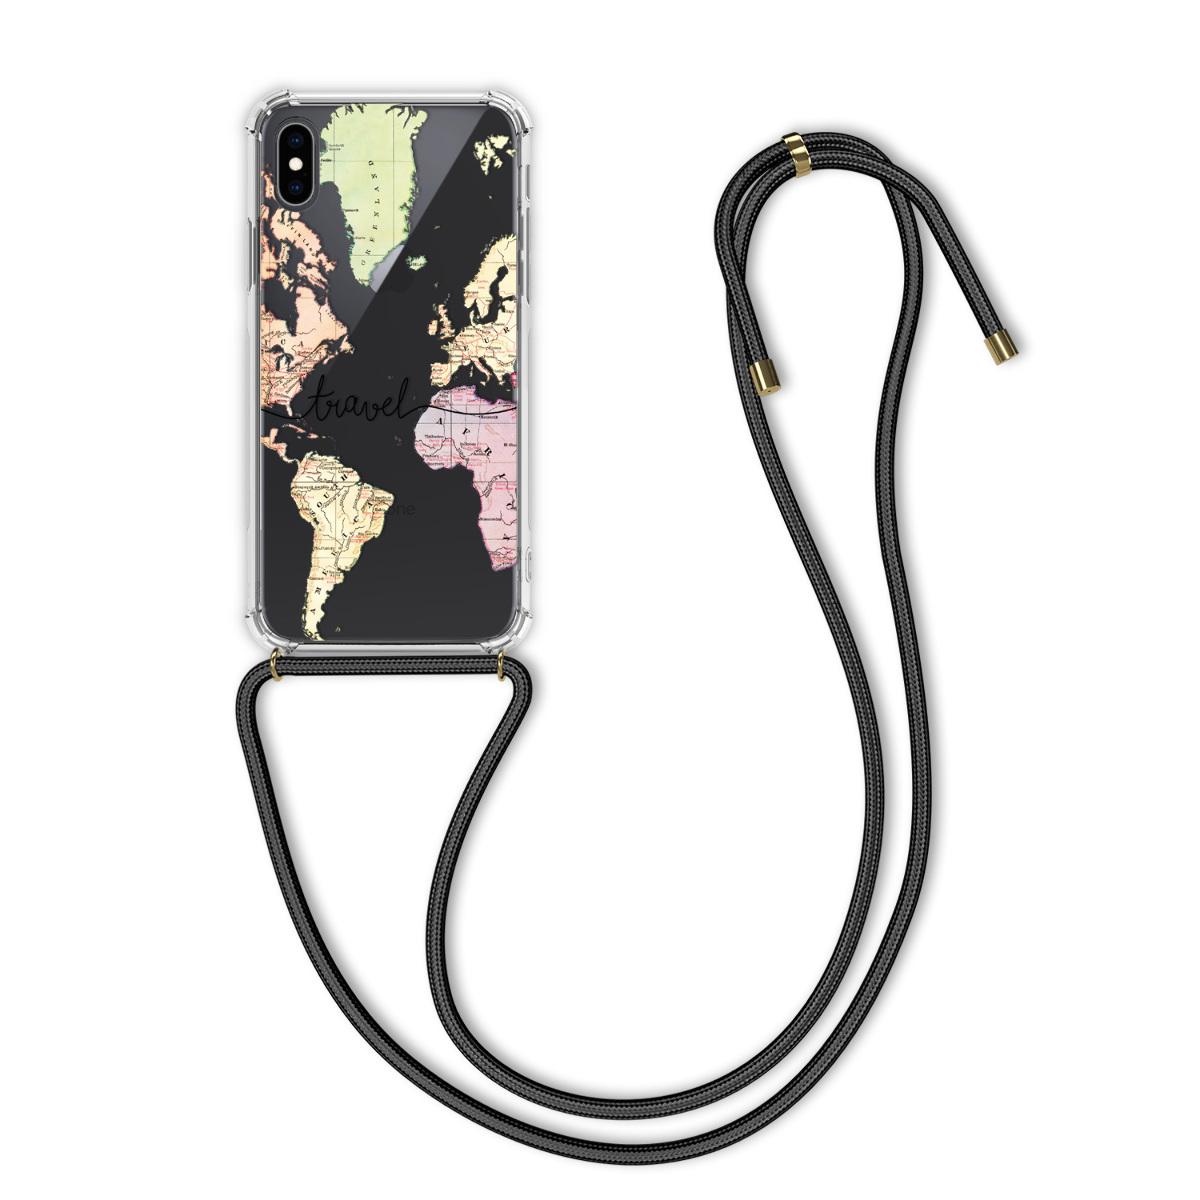 Kvalitní silikonové TPU pouzdro pro Apple iPhone XS - Travel Black | Multicolor | Transparent